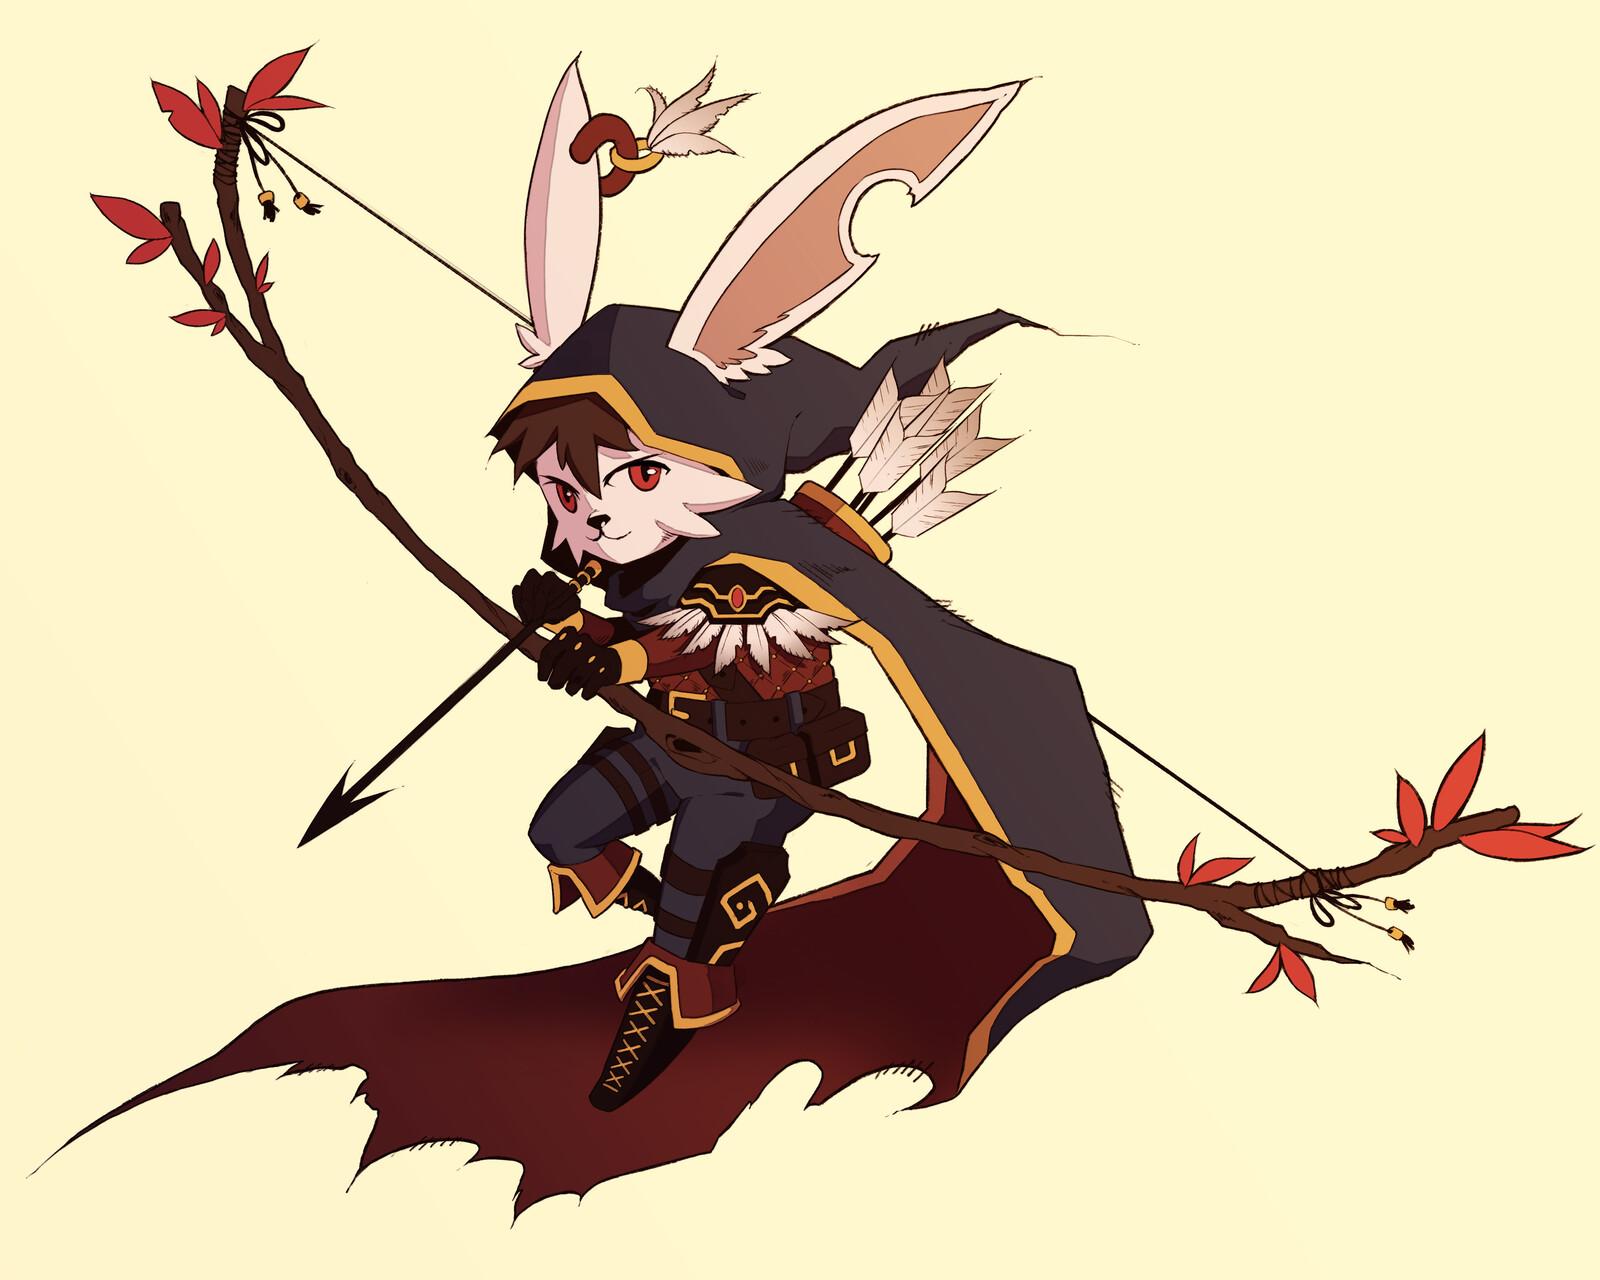 Bunny Ranger